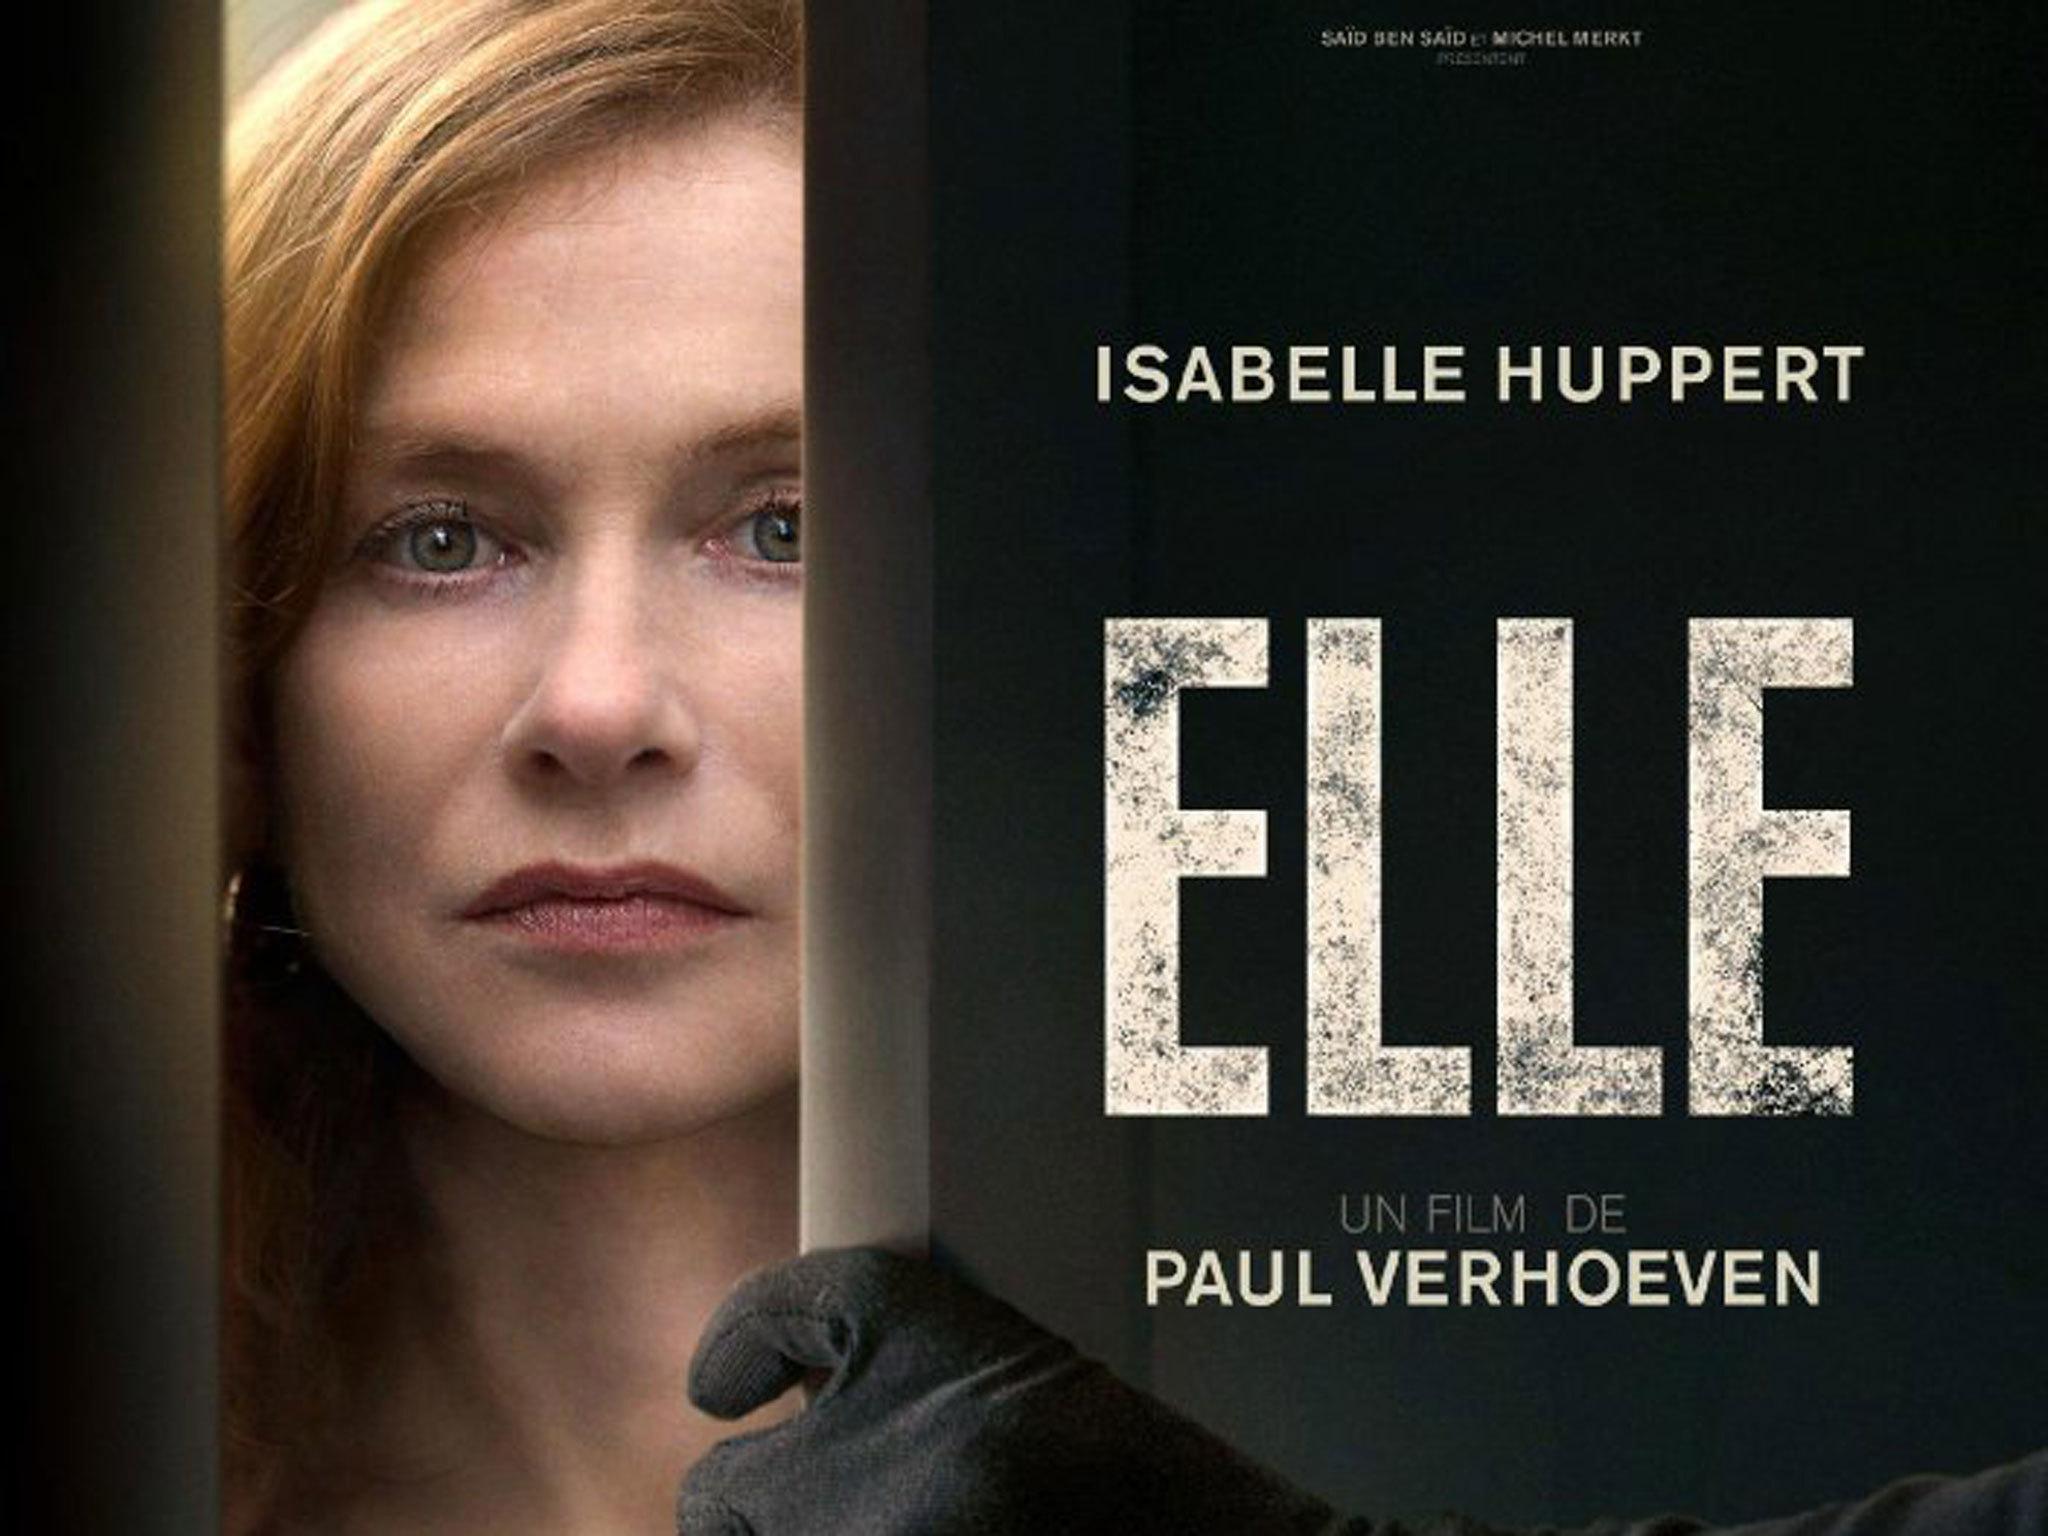 2016 cannes film festival, Elle